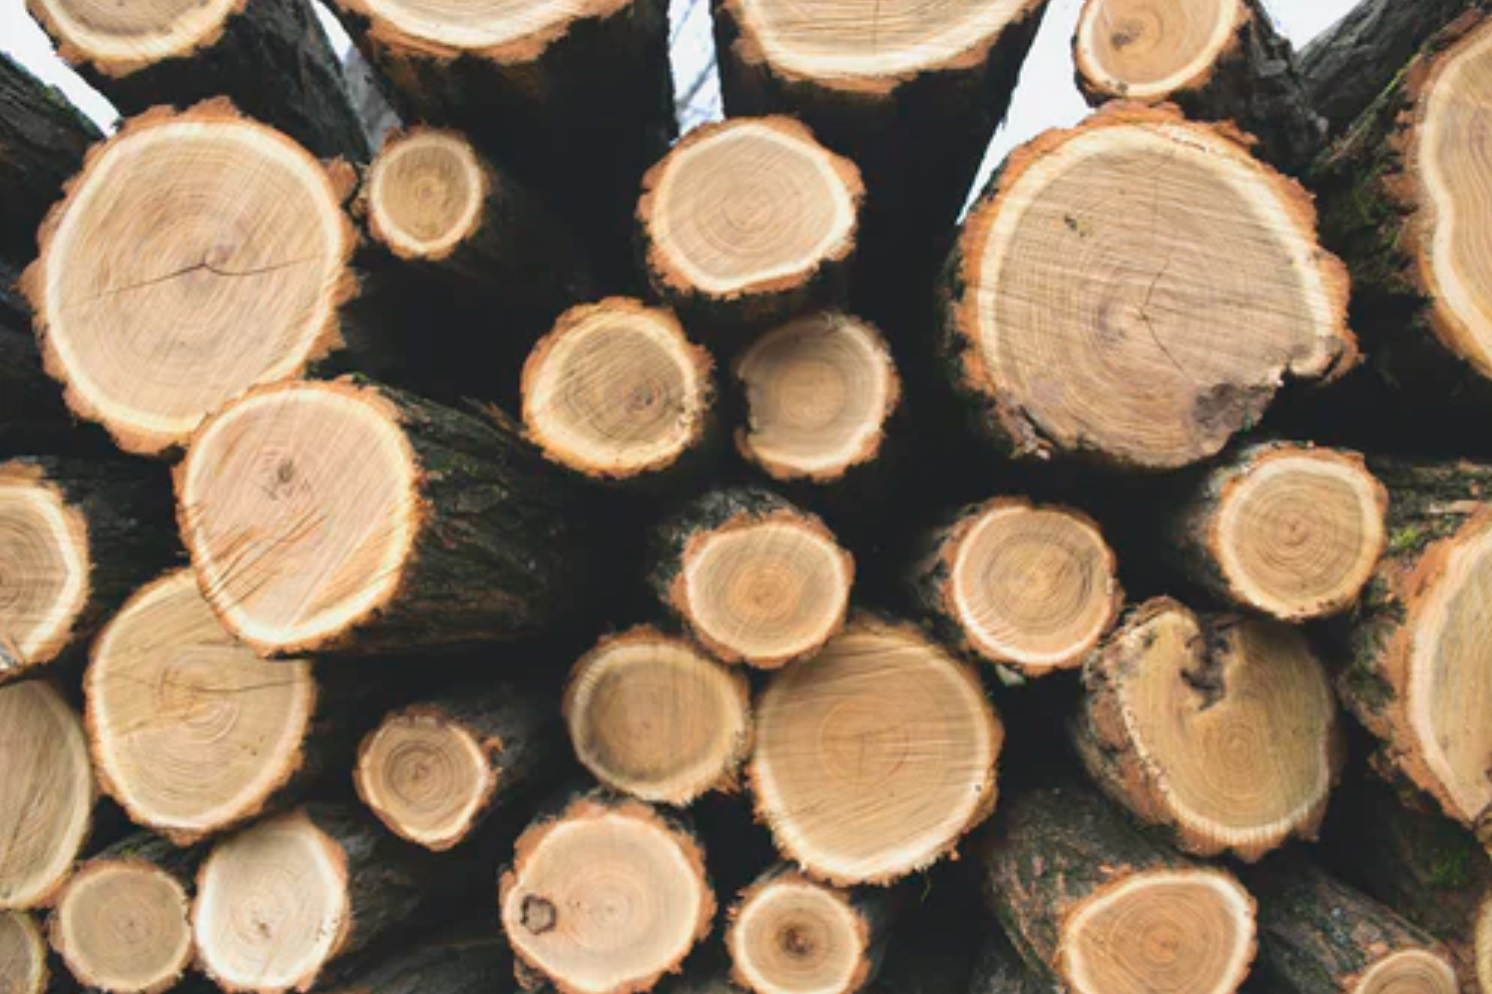 https://naturalresourcereport.com/wp-content/uploads/2021/12/timber-lumber-forest2.jpg